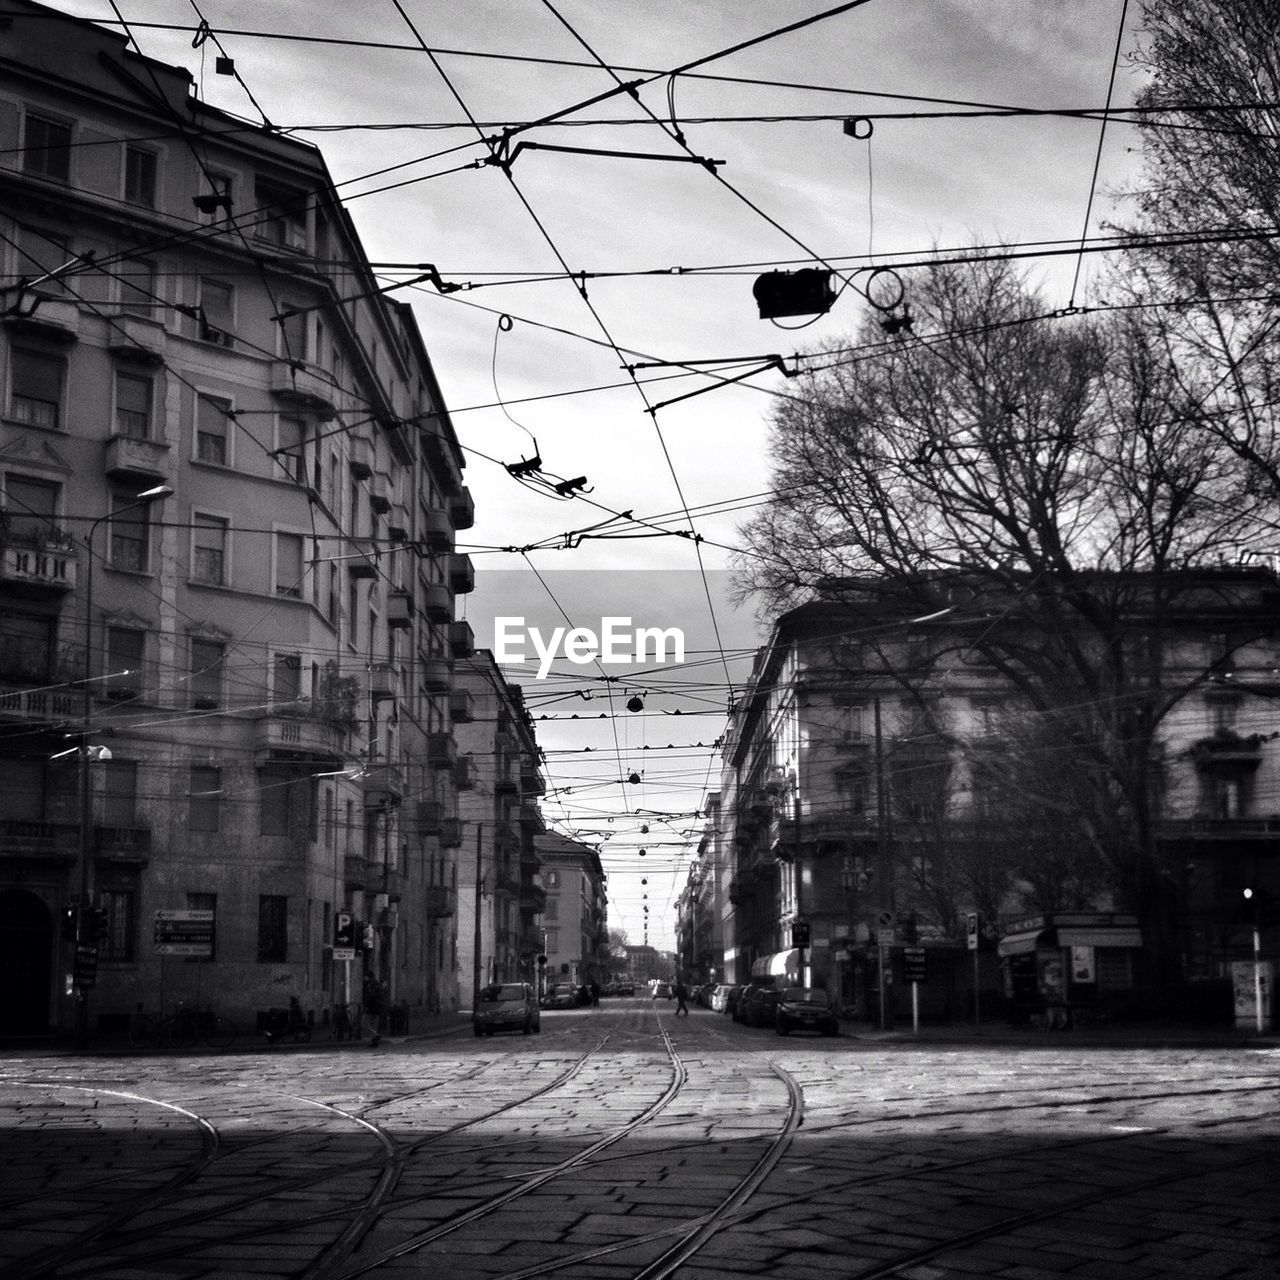 Tram tracks on street along buildings